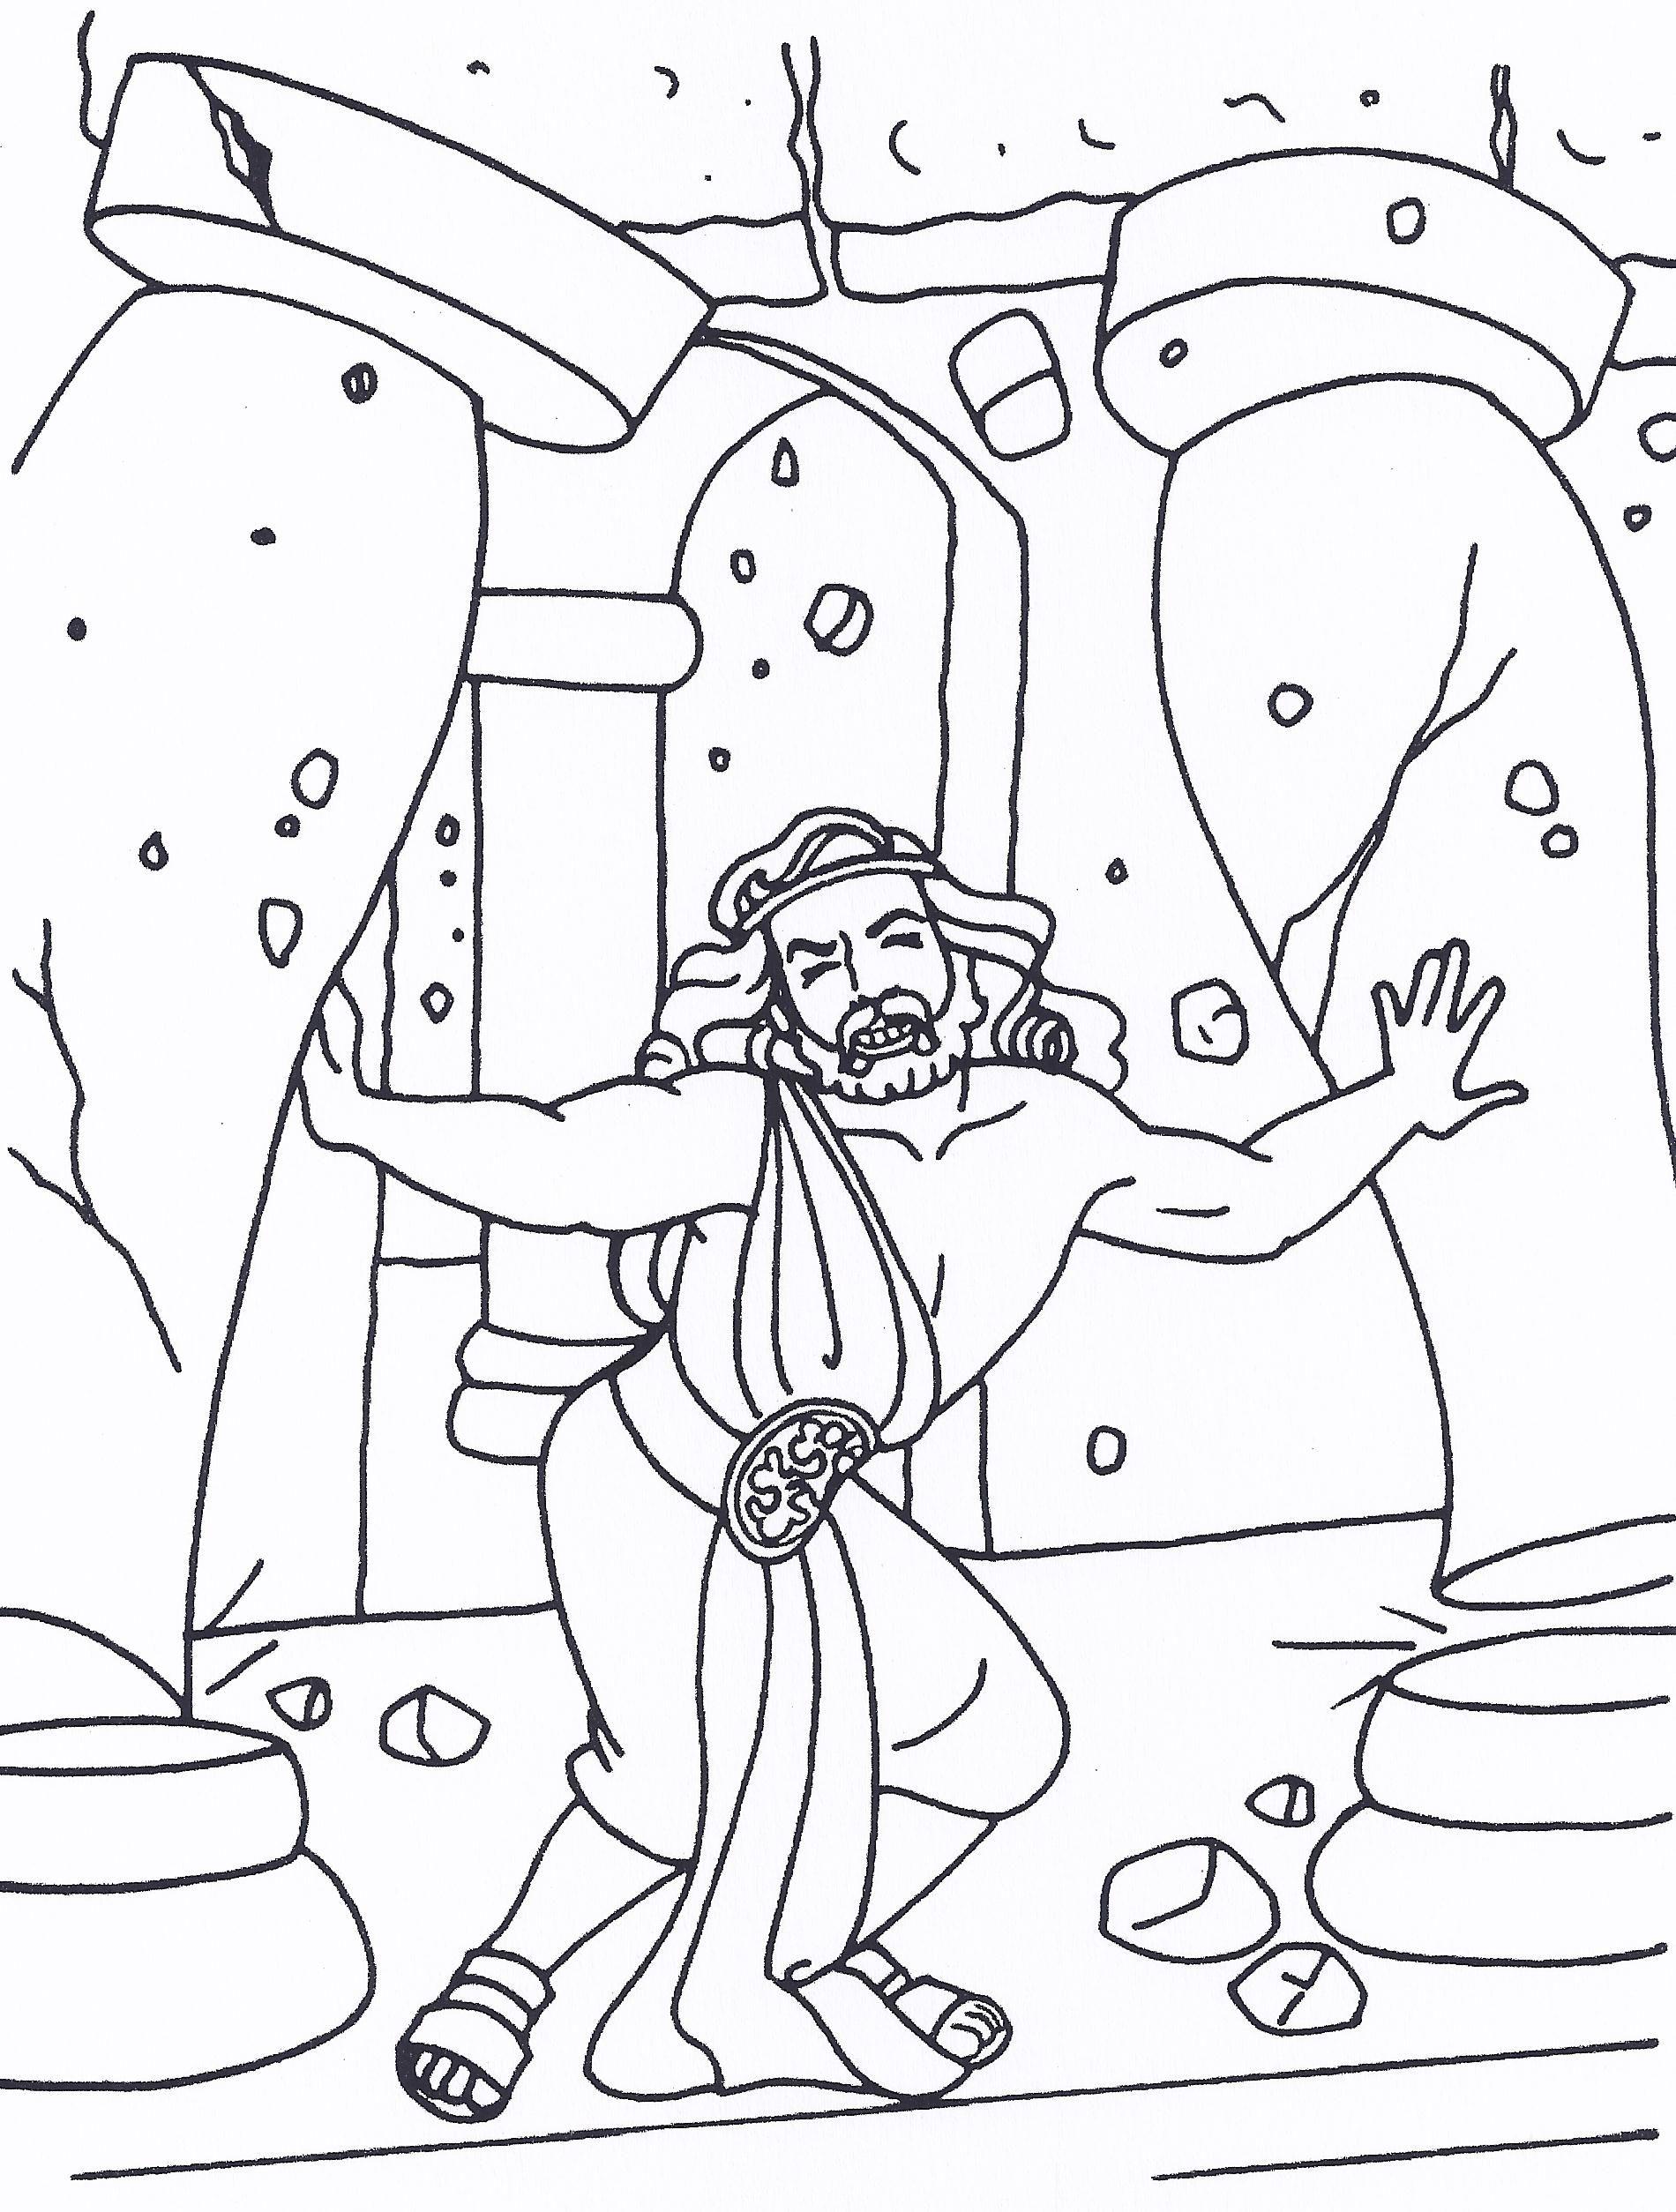 Samson | Bible characters | Pinterest | Sunday school